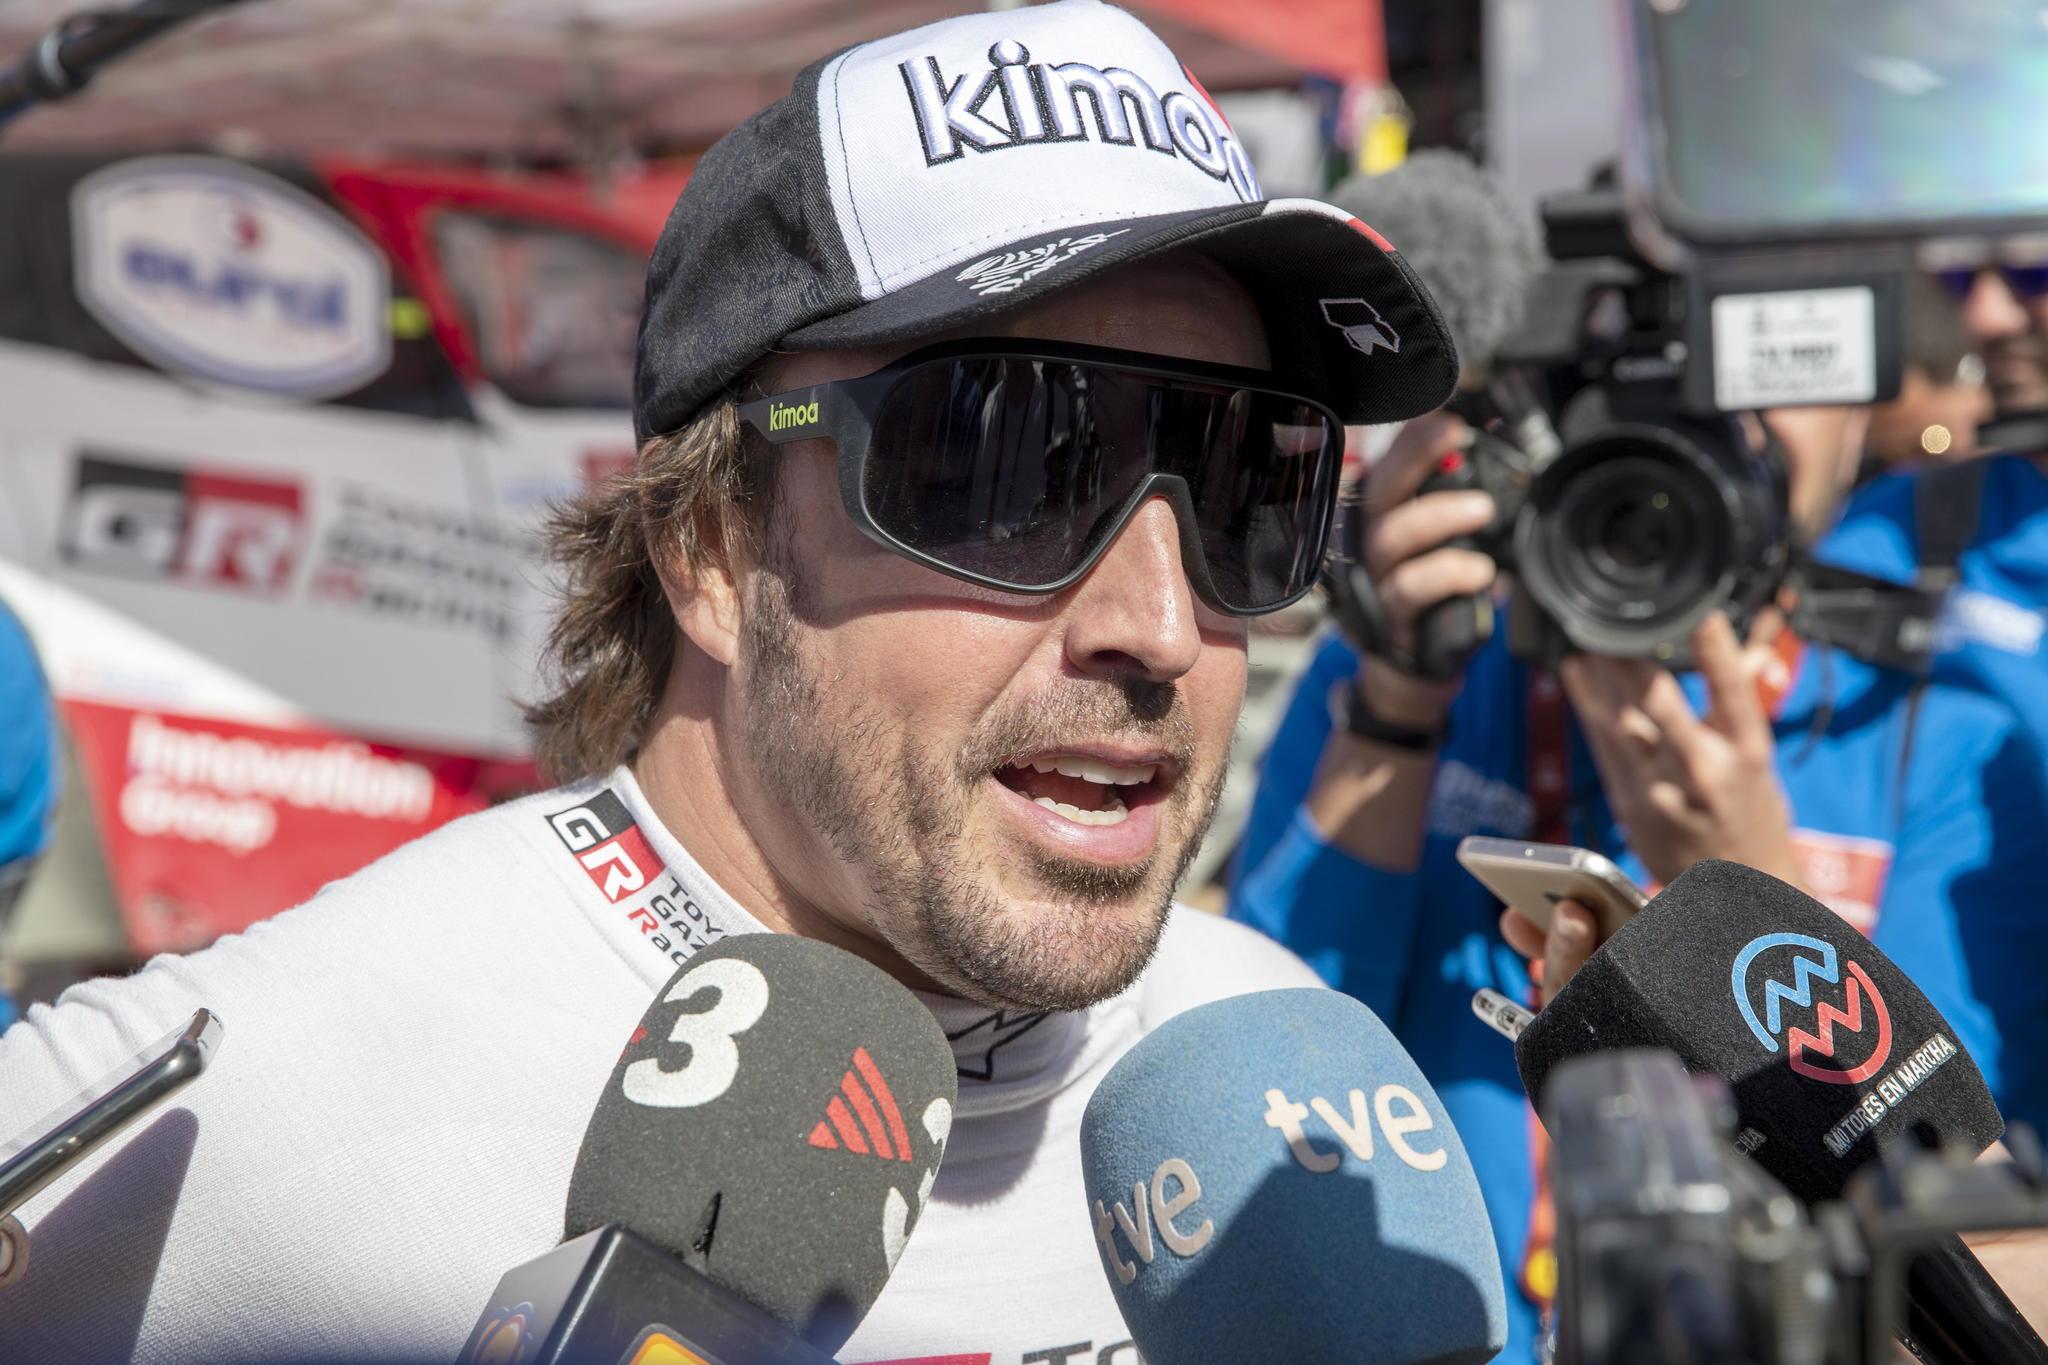 Wadi Al-dawasir (Saudi Arabia), 13/01/2020.- Fernando <HIT>Alonso</HIT> of Spain (Toyota Gaozo Racing) addresses to media after stage eight of the Rally Dakar 2020 in Wadi Al-Dawasir, Saudi Arabia, 13 January 2020. (Arabia Saudita, España) EFE/EPA/ANDRE PAIN